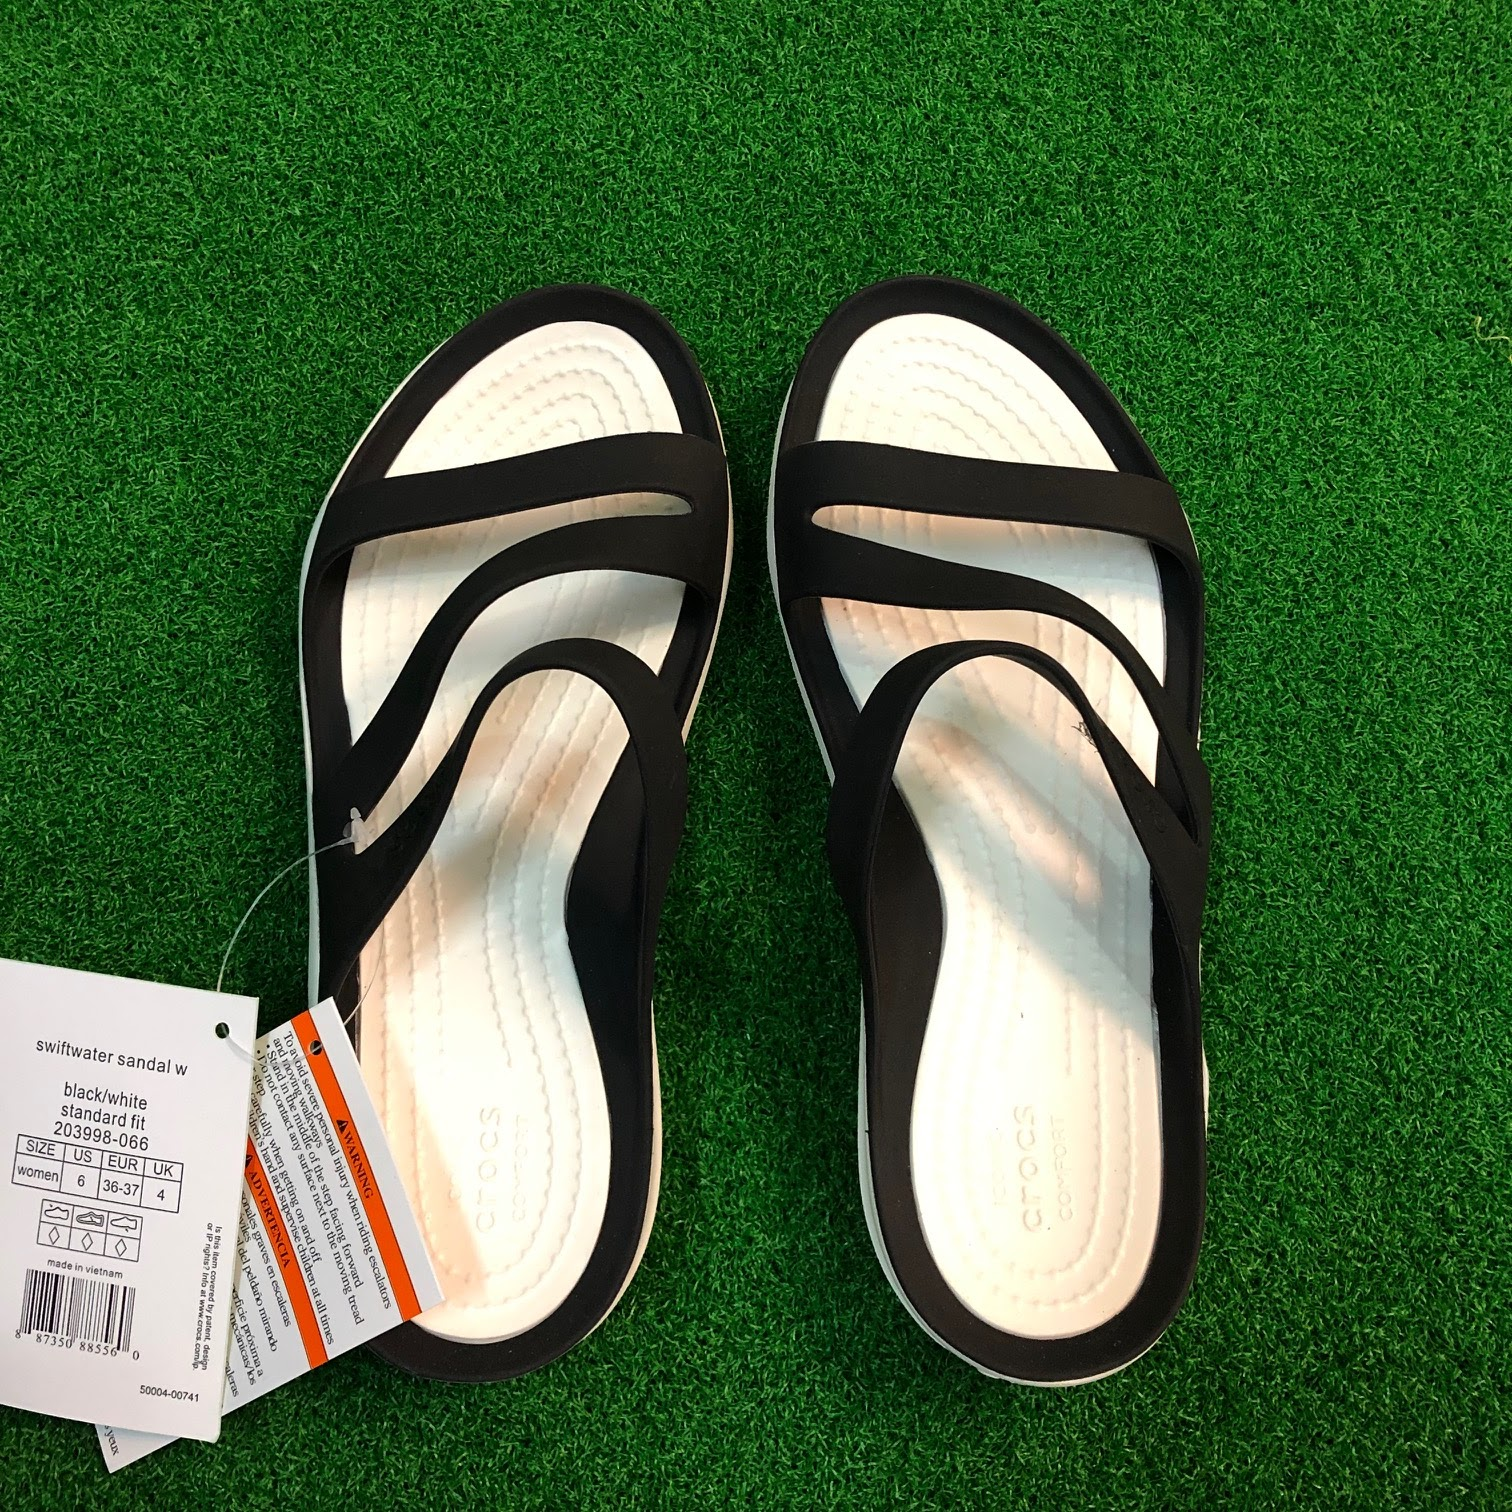 Women Crocs Swiftwater Sandal 203998-066 Black White 100/% Authentic Brand New